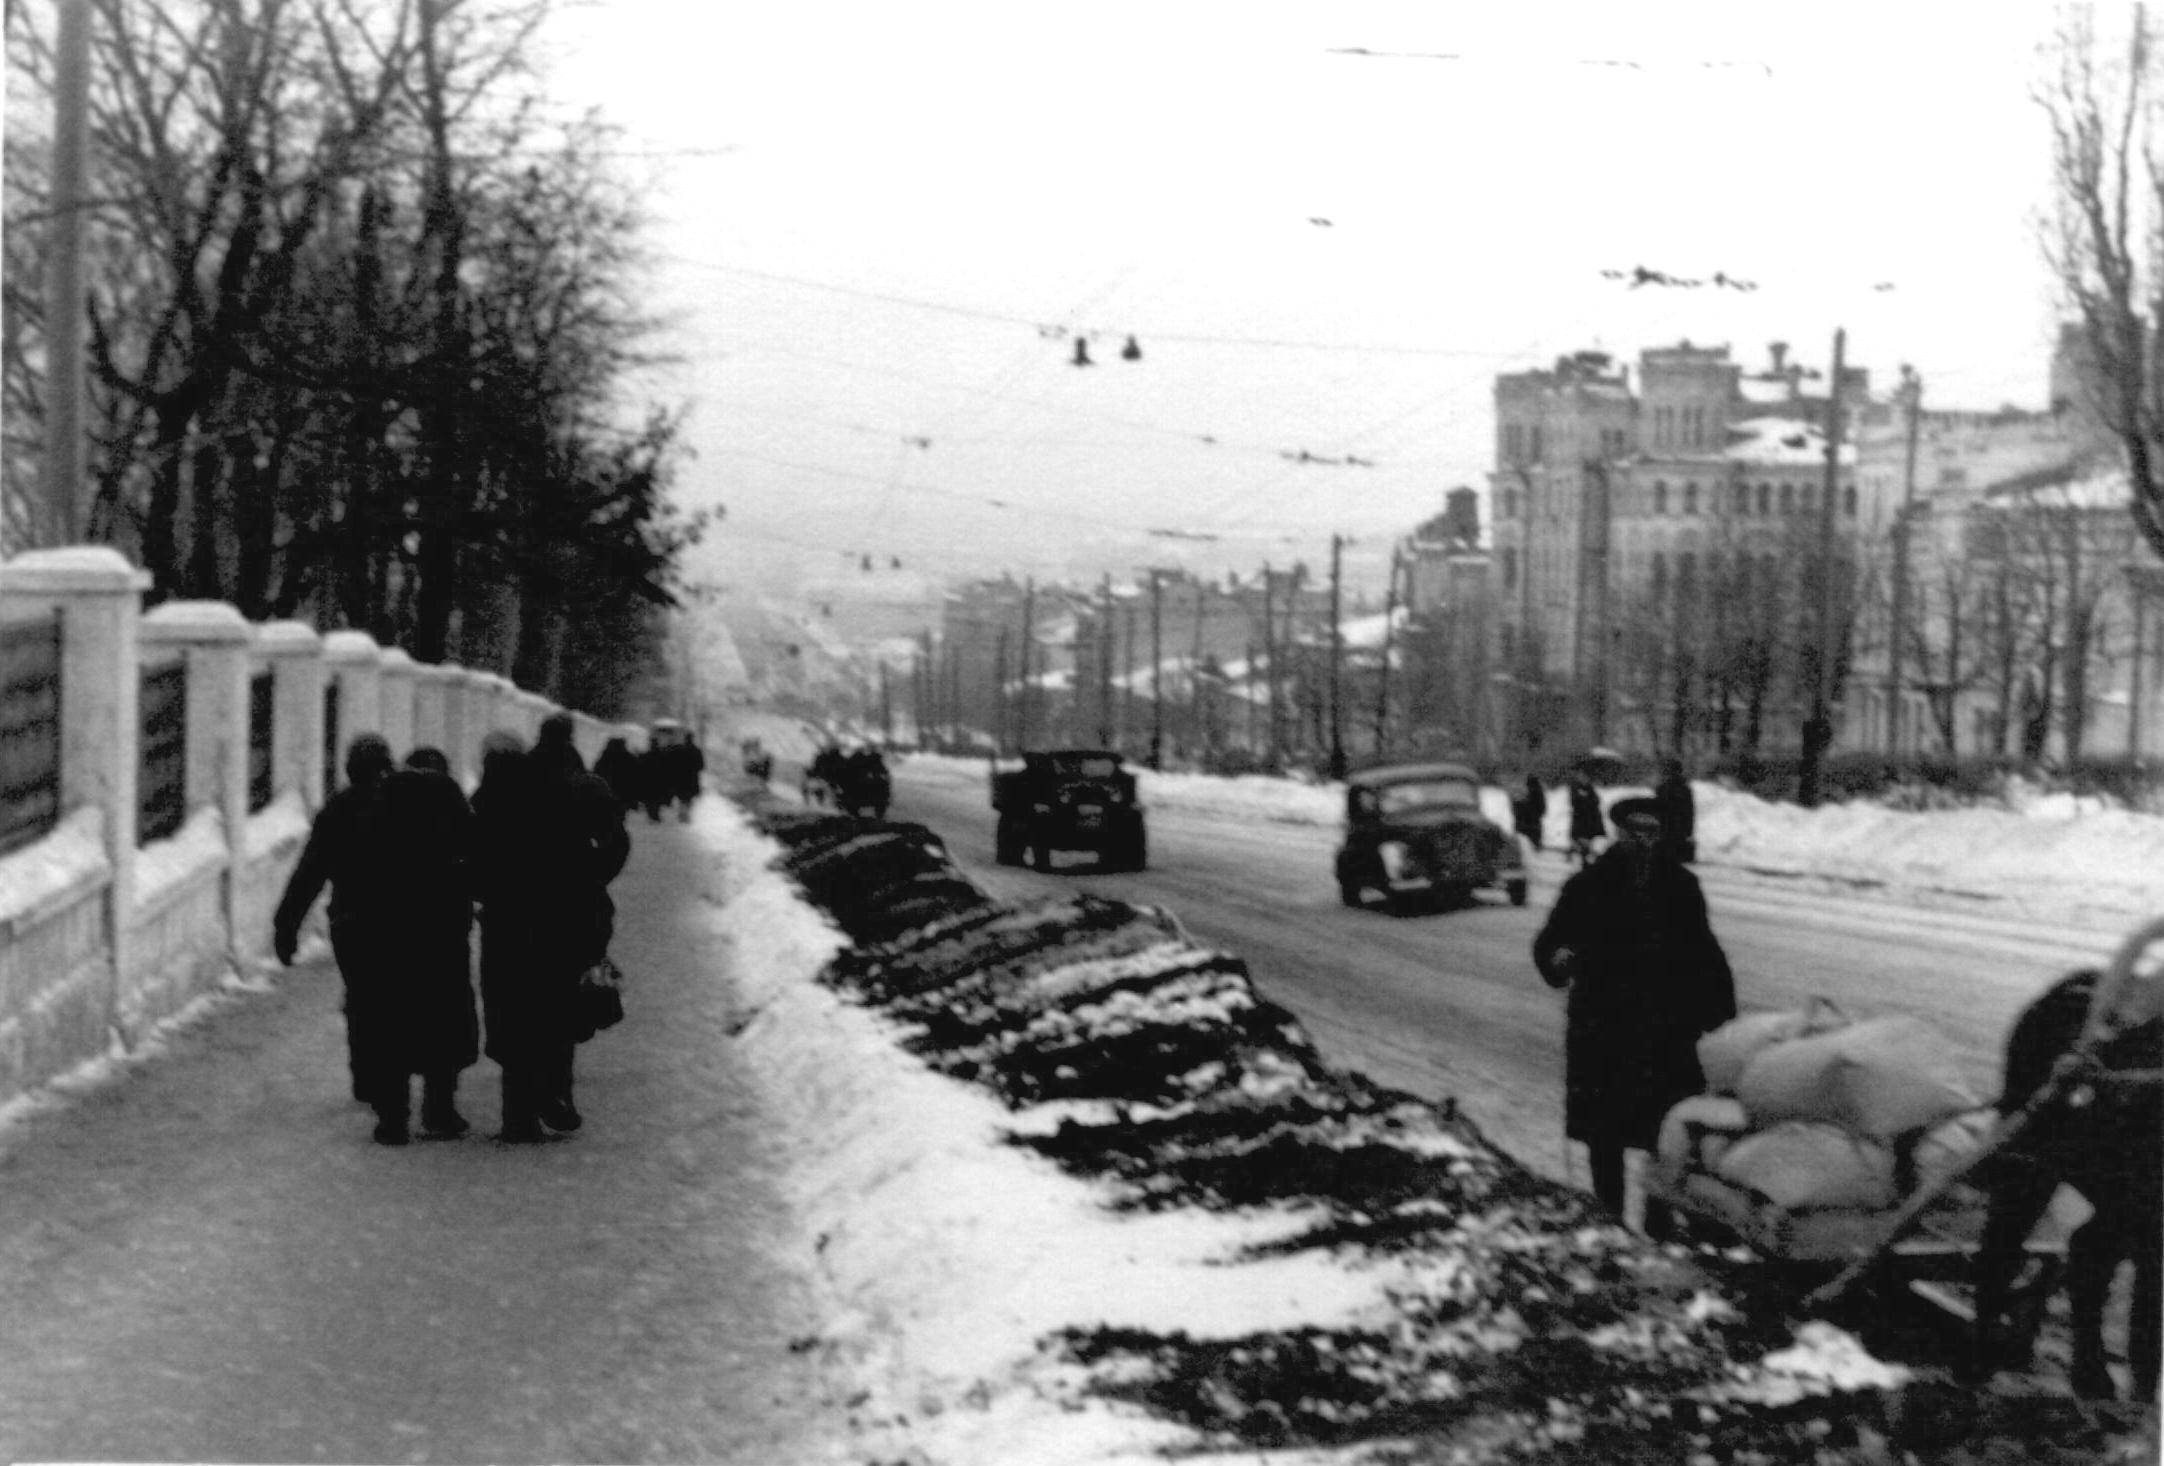 Бульвар Т. Шевченко. Февраль, 1942 г.